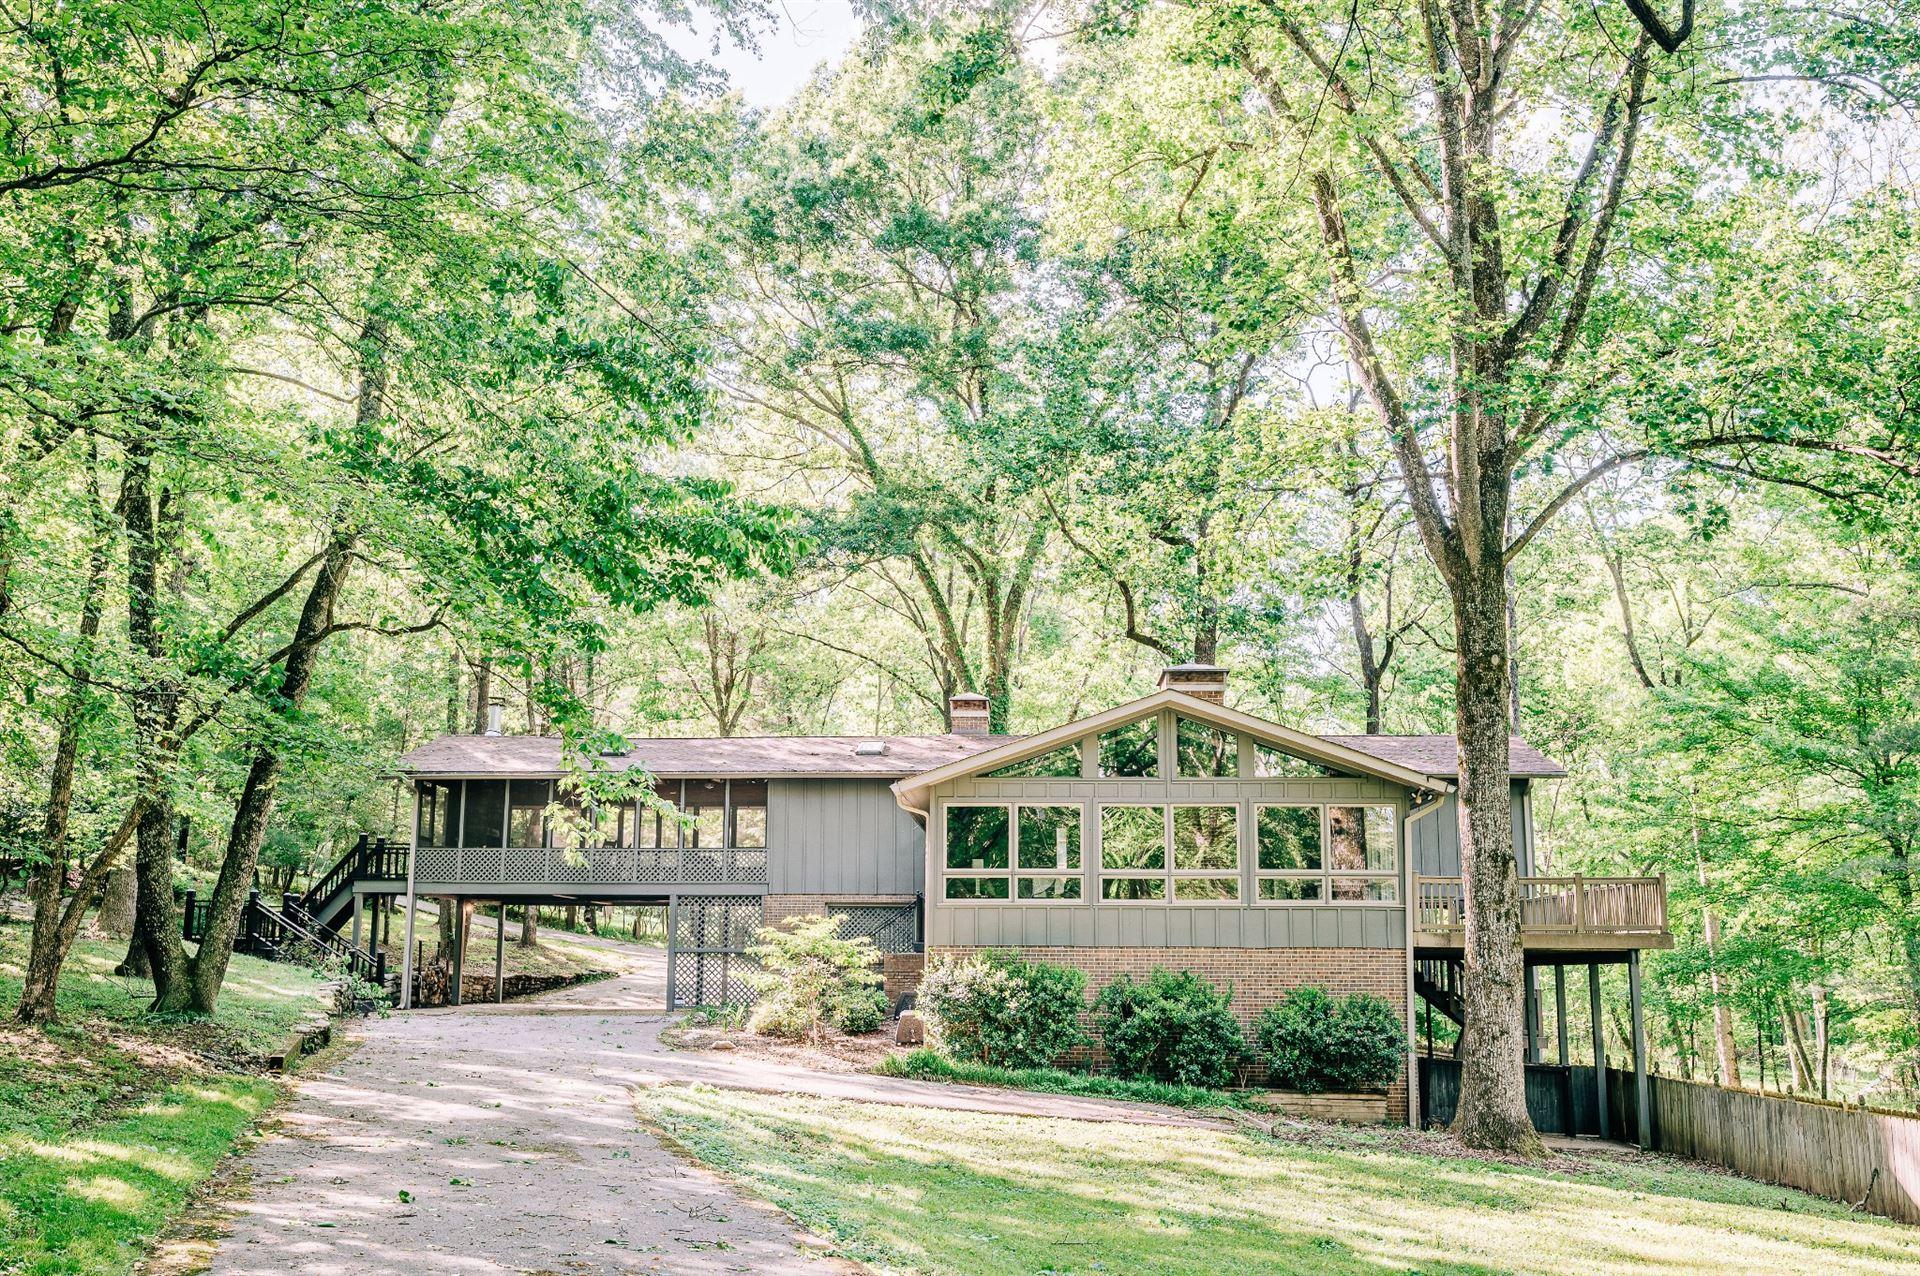 2419 Hidden Lake Cir, Columbia, TN 38401 - MLS#: 2251399